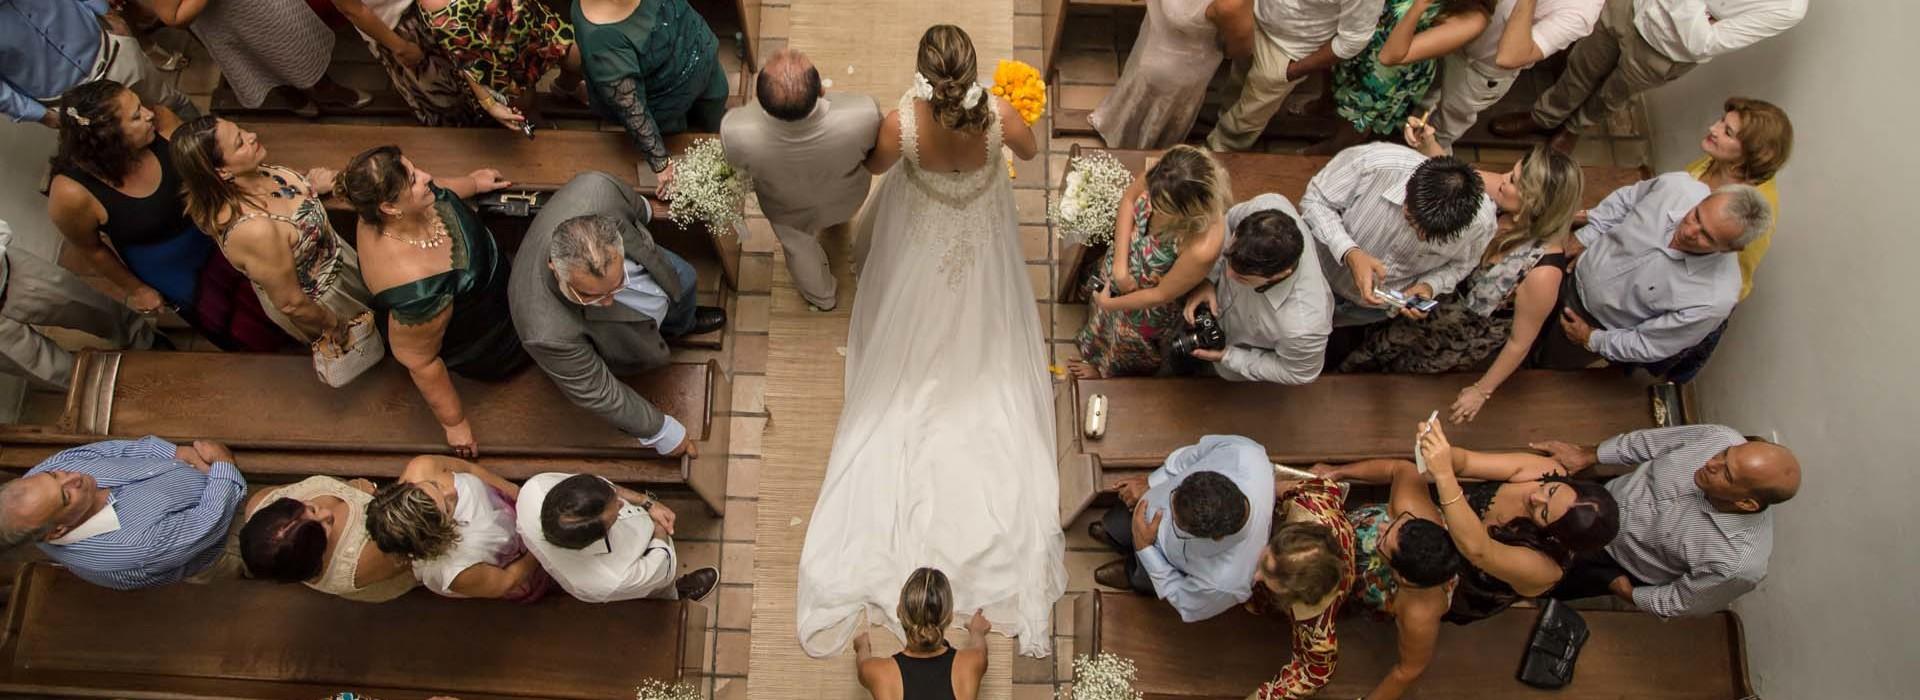 Wedding de Janmile & Oximane em Arraial D'ajuda - Bahia